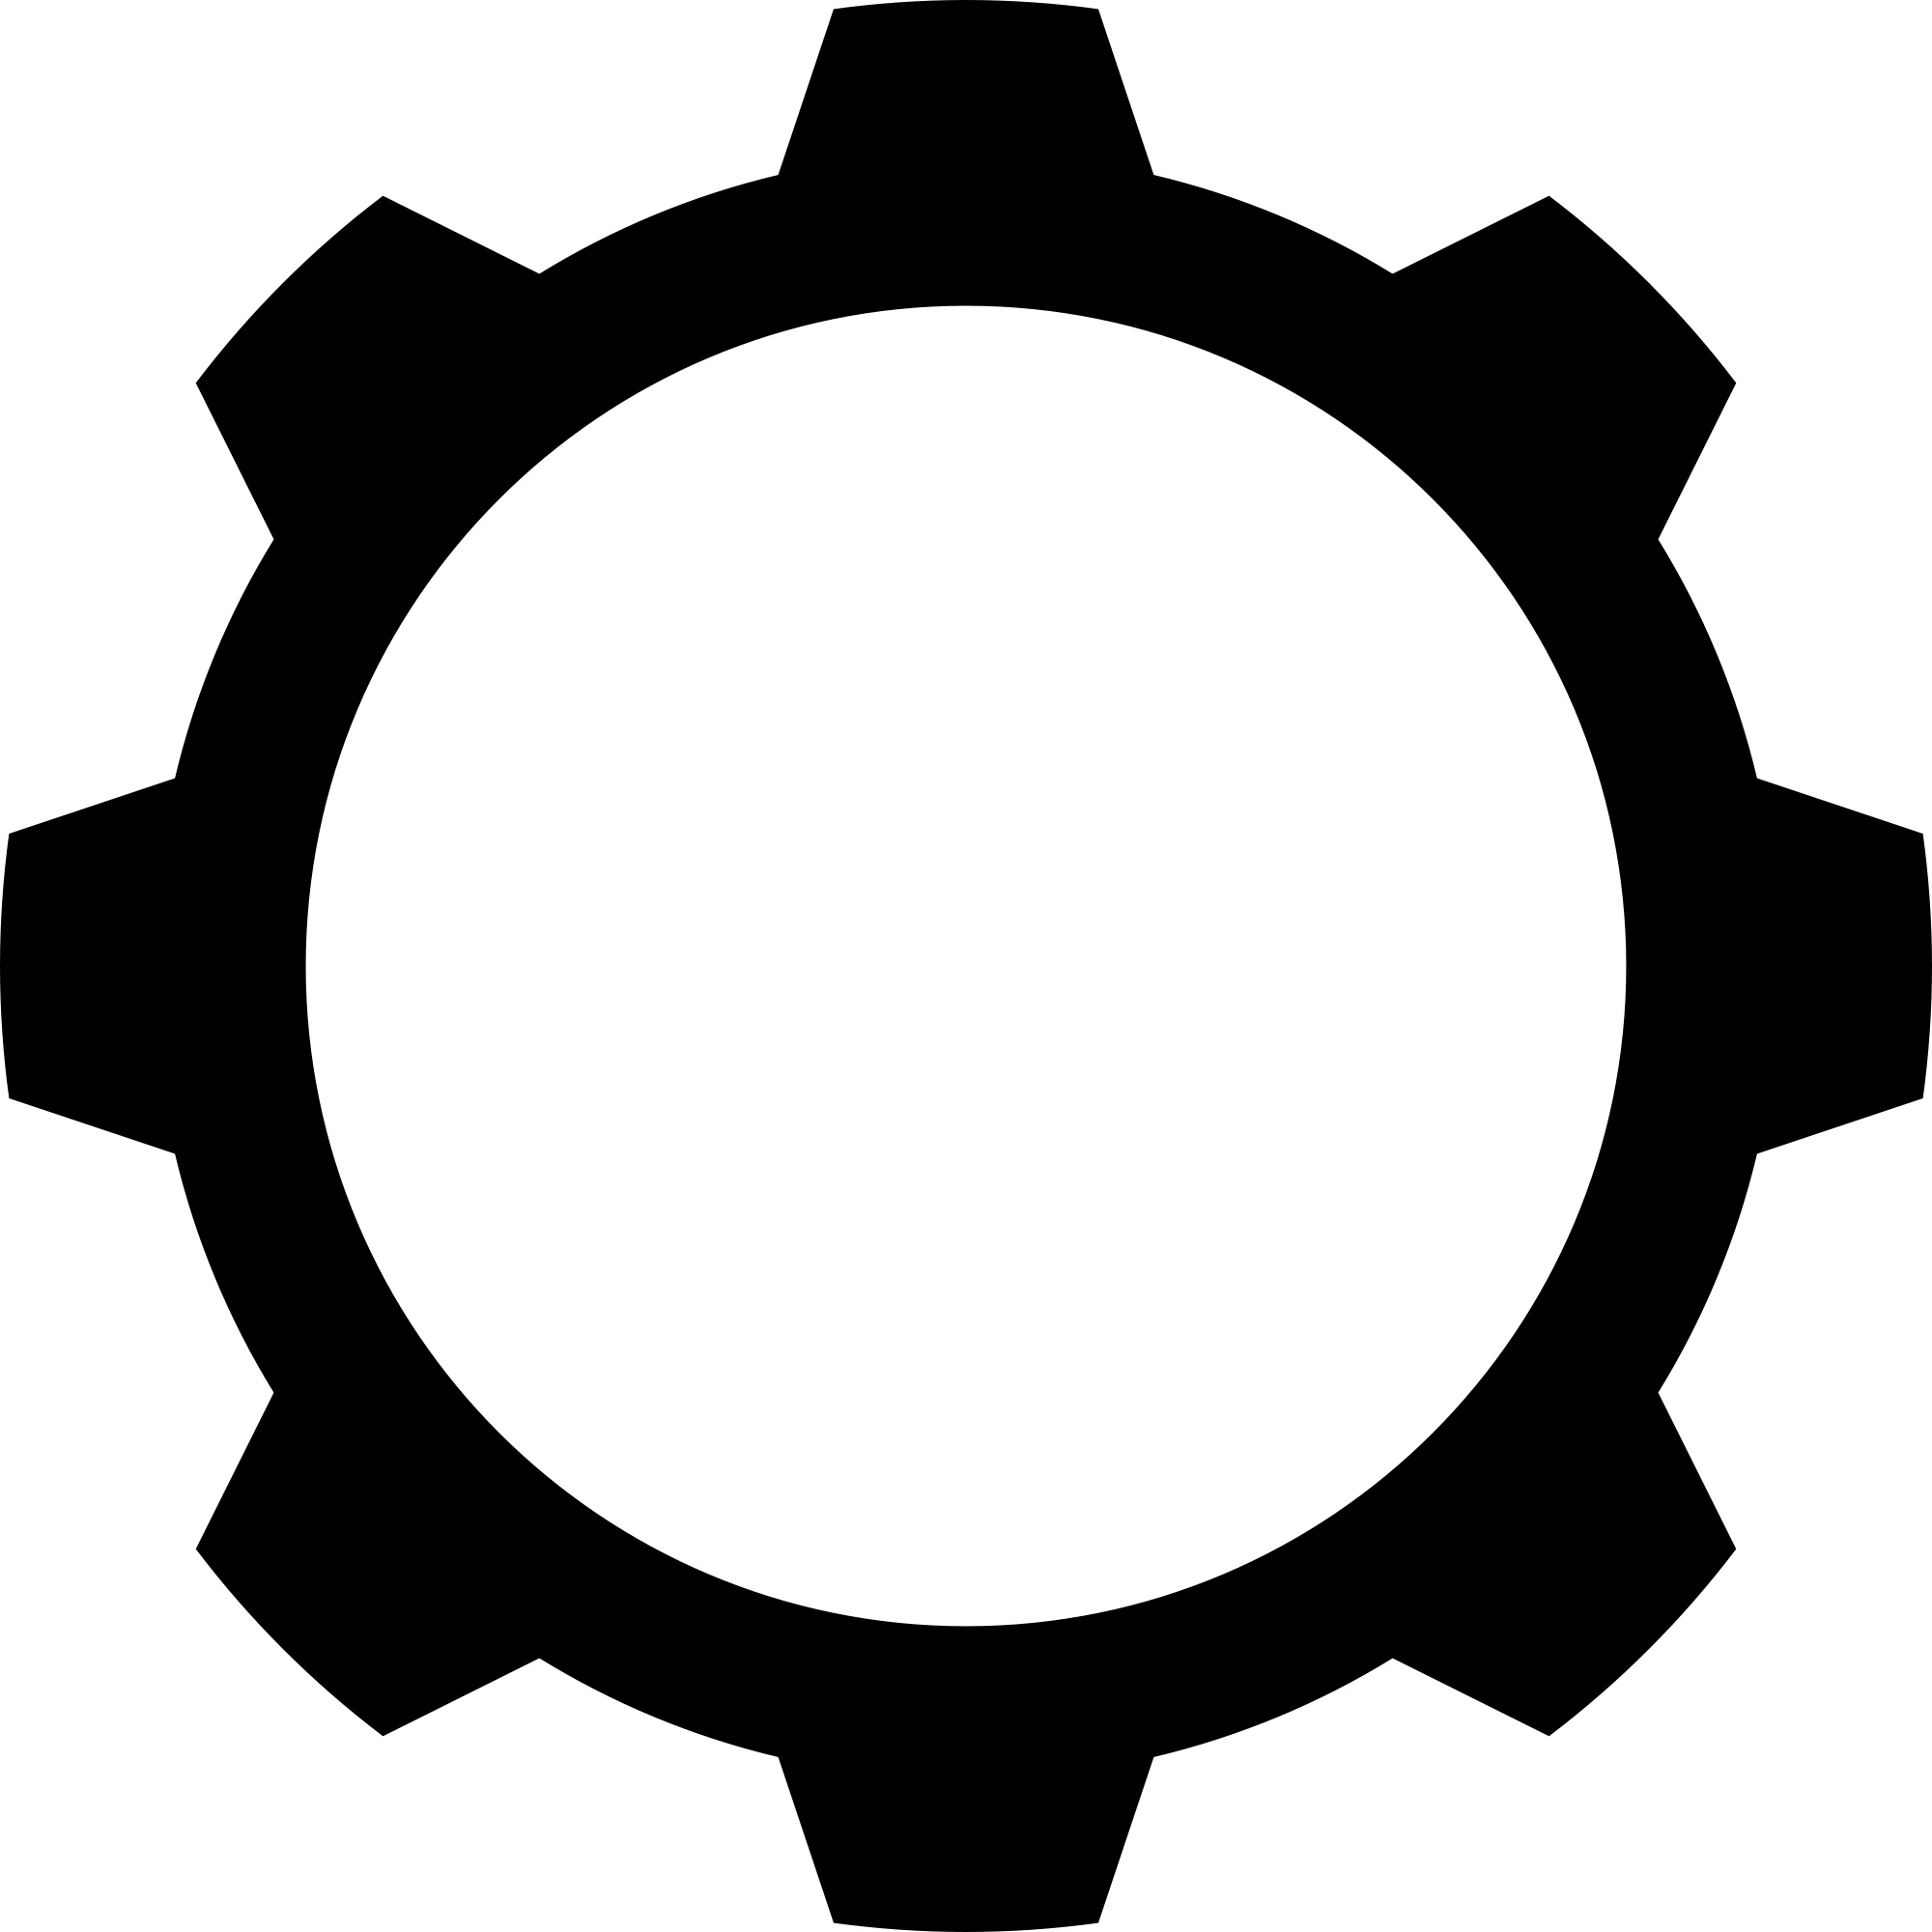 Gear Logo Vector PNG Transparent Gear Lo #141848.